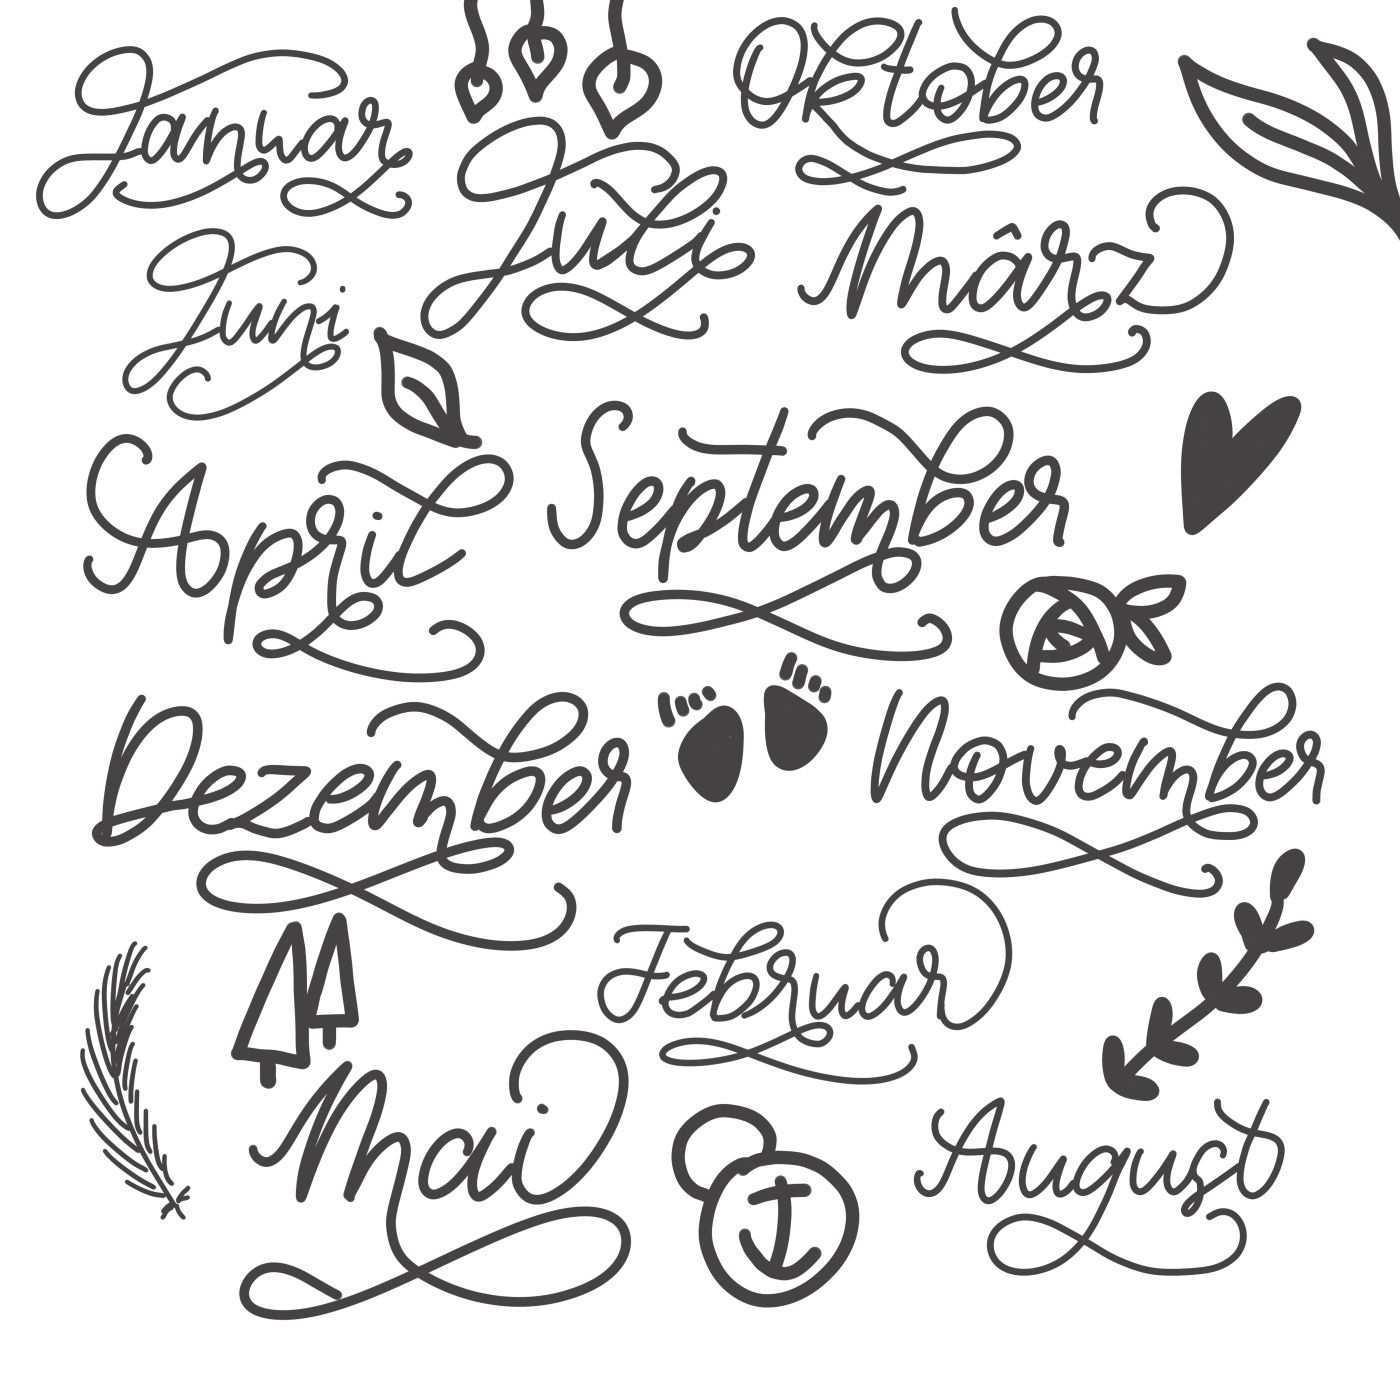 Lettering Monate Brushlettering Handlettering Inspiration Vorlagen Kalender Vorlagen Diy Lettering Handlettering Vorlagen